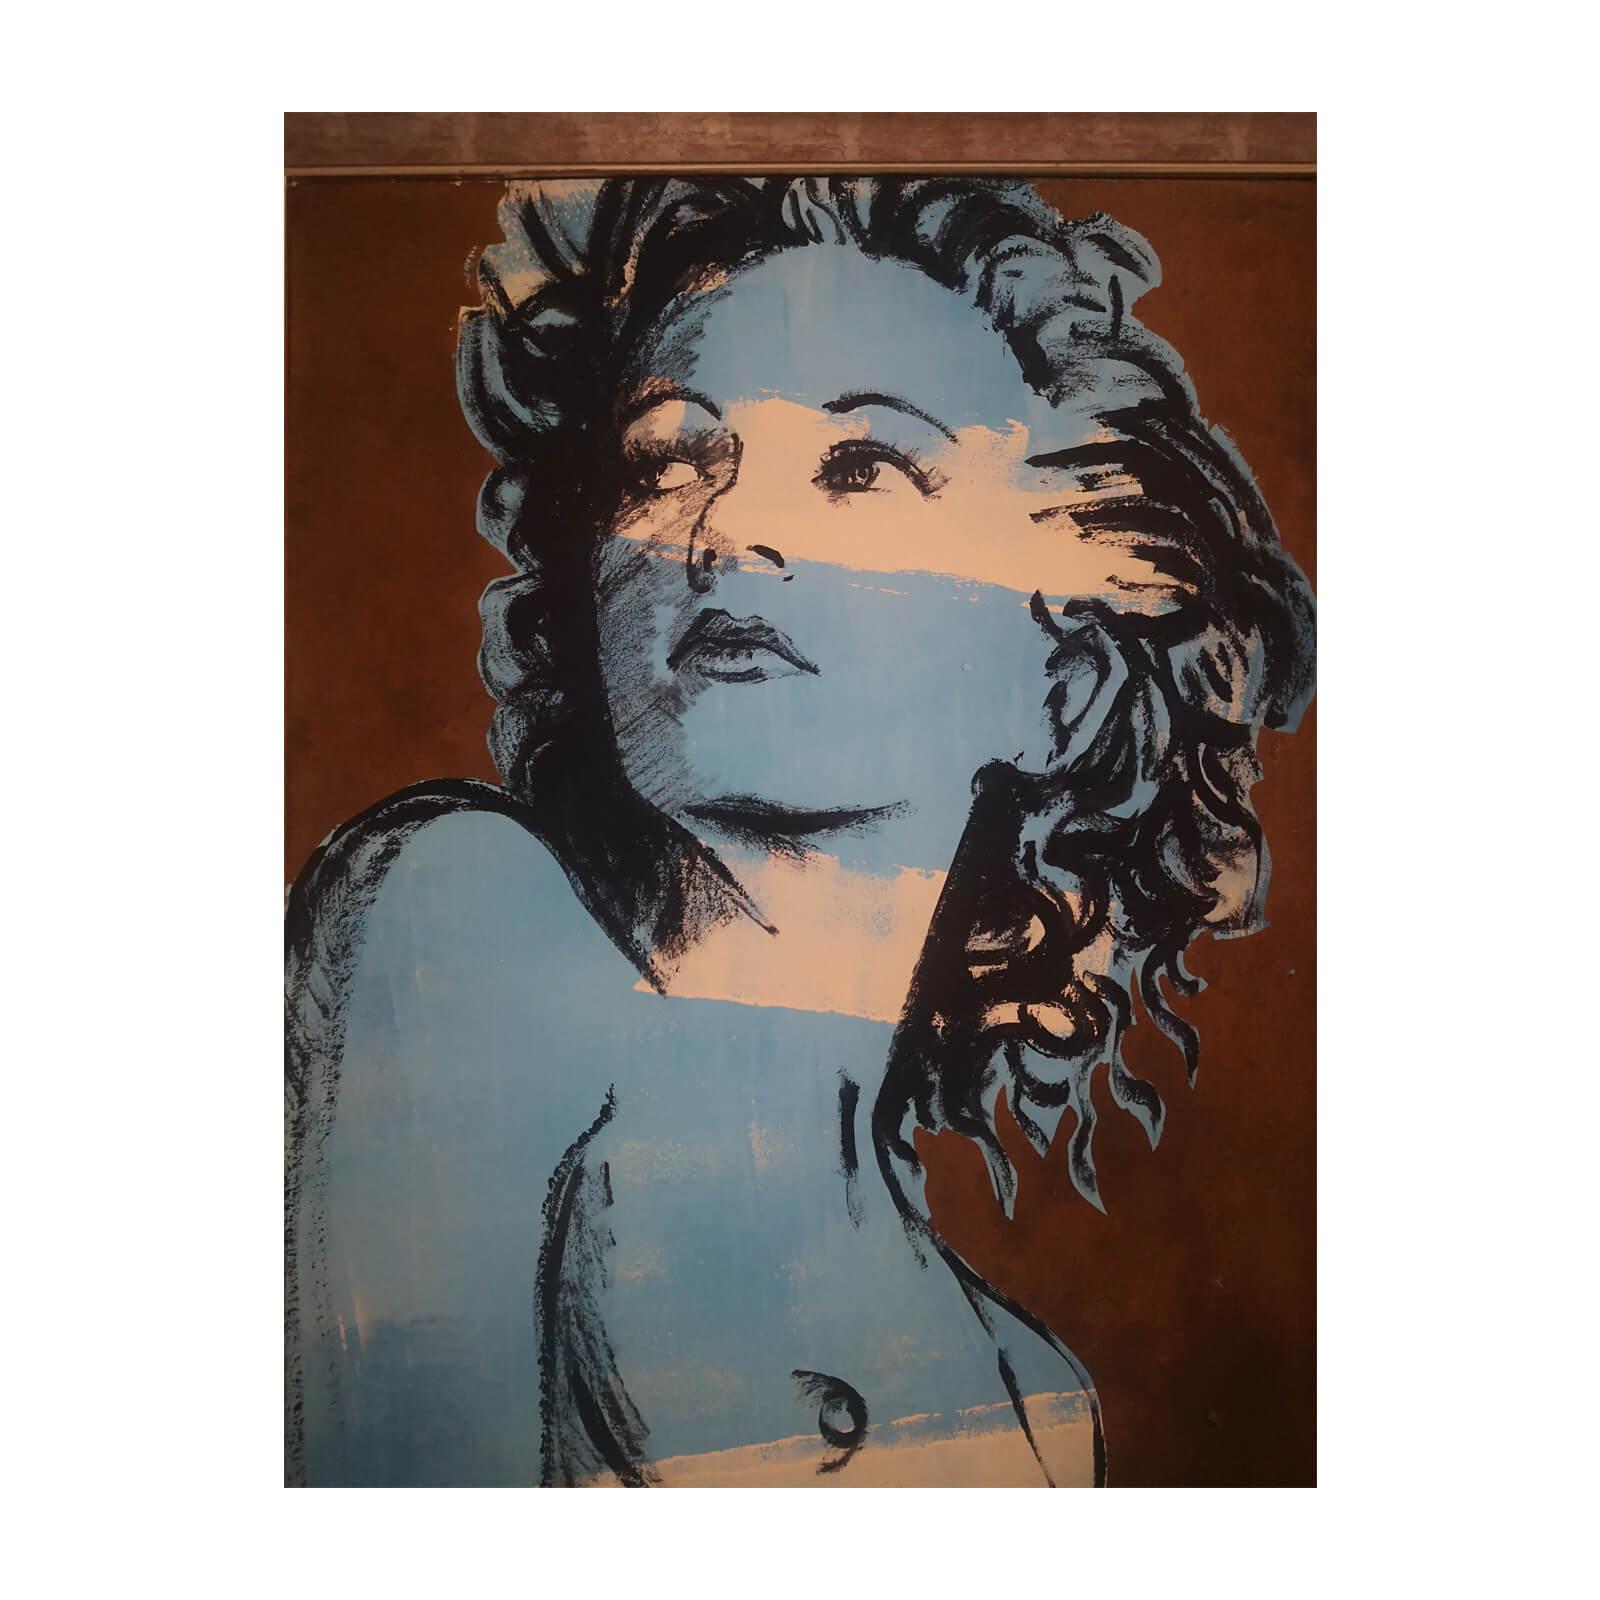 David Bromley, Hillary, original artwork